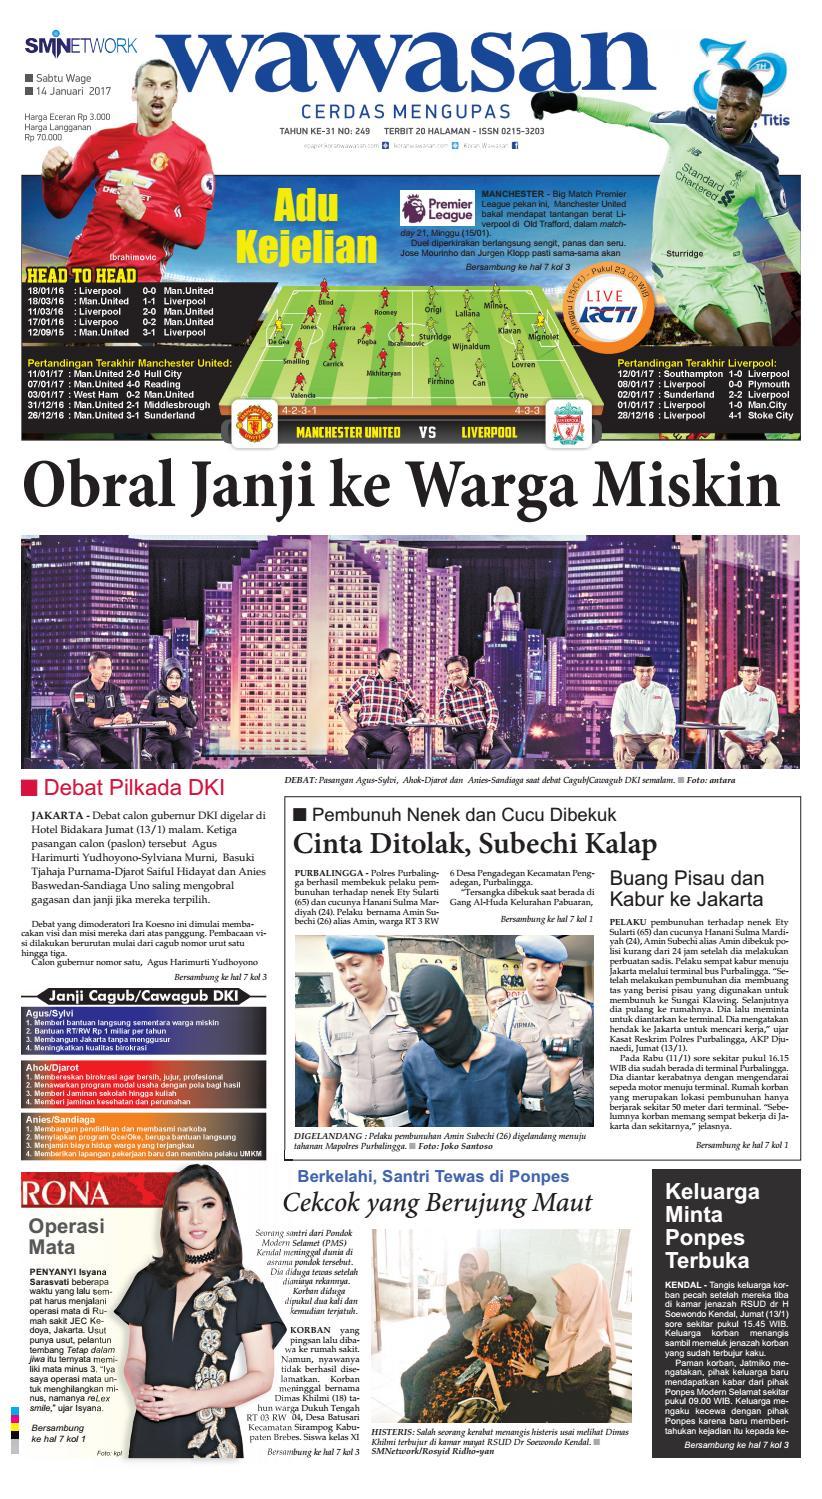 Wawasan 14 Januari 2017 By Koran Pagi Issuu Produk Ukm Bumn Batik Tulis Babon Angrem